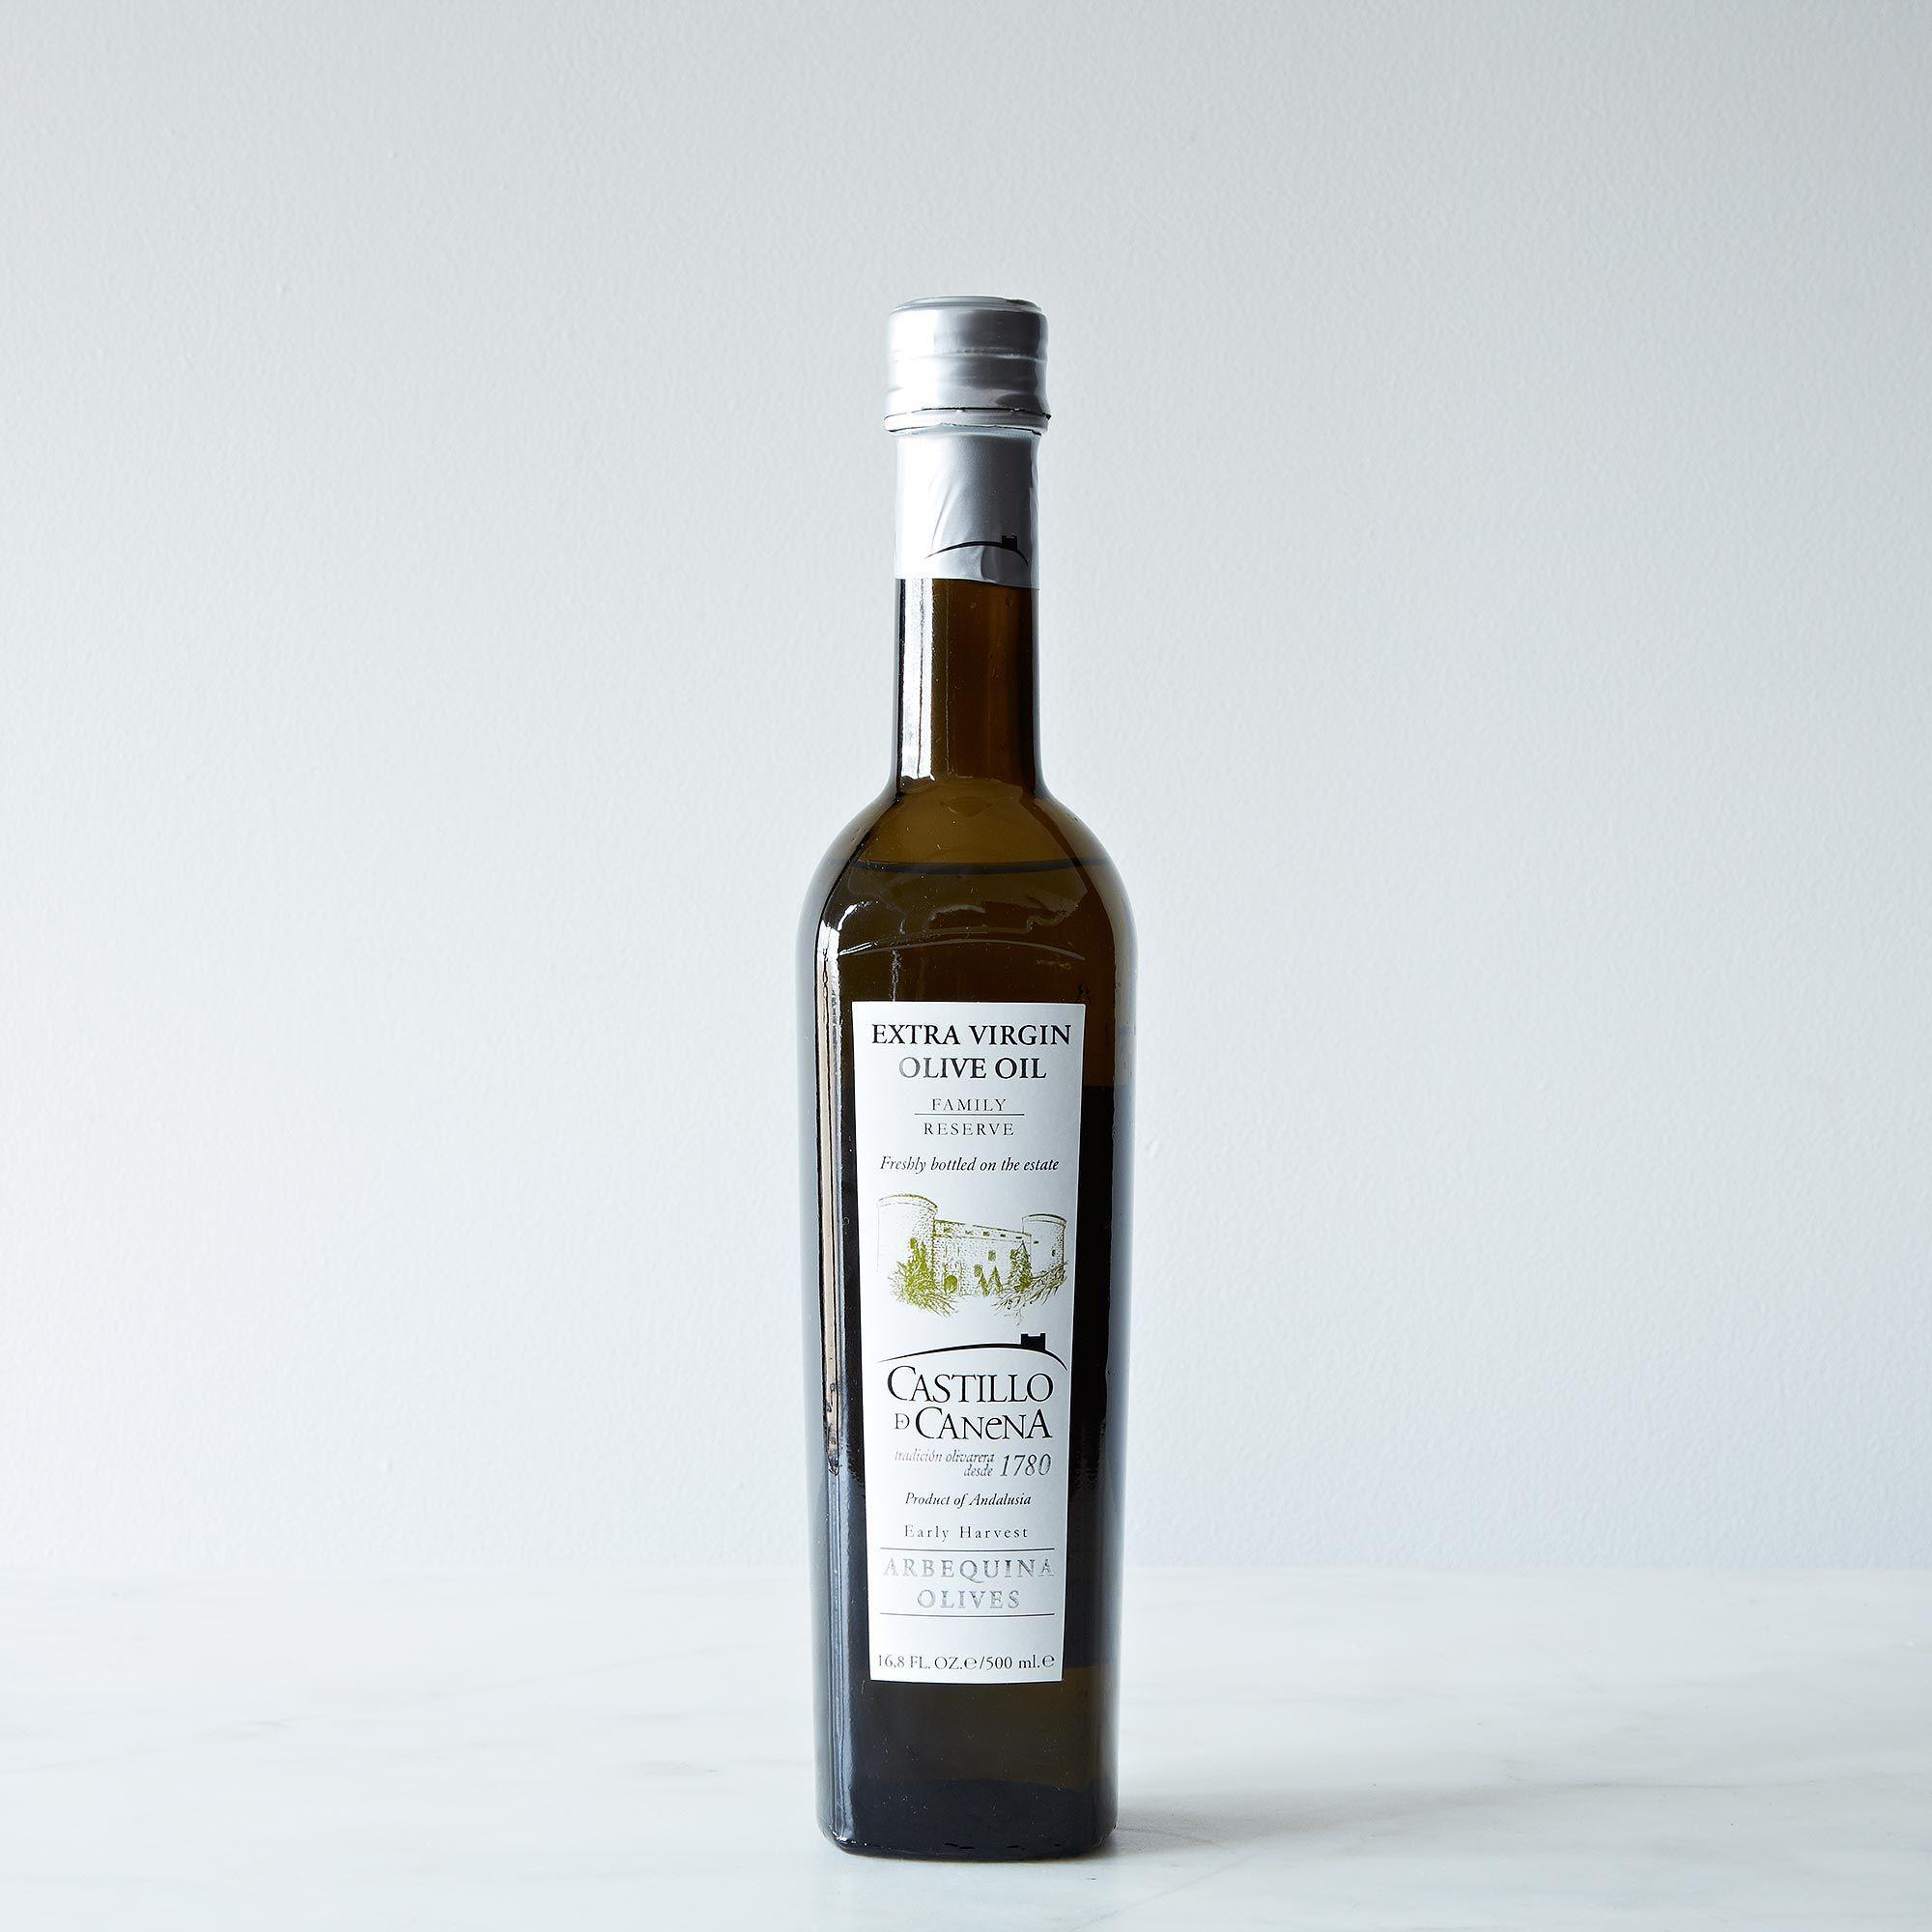 C757f8d8 a0f5 11e5 a190 0ef7535729df  2014 0116 raposos spanish olive oil arberquina 003